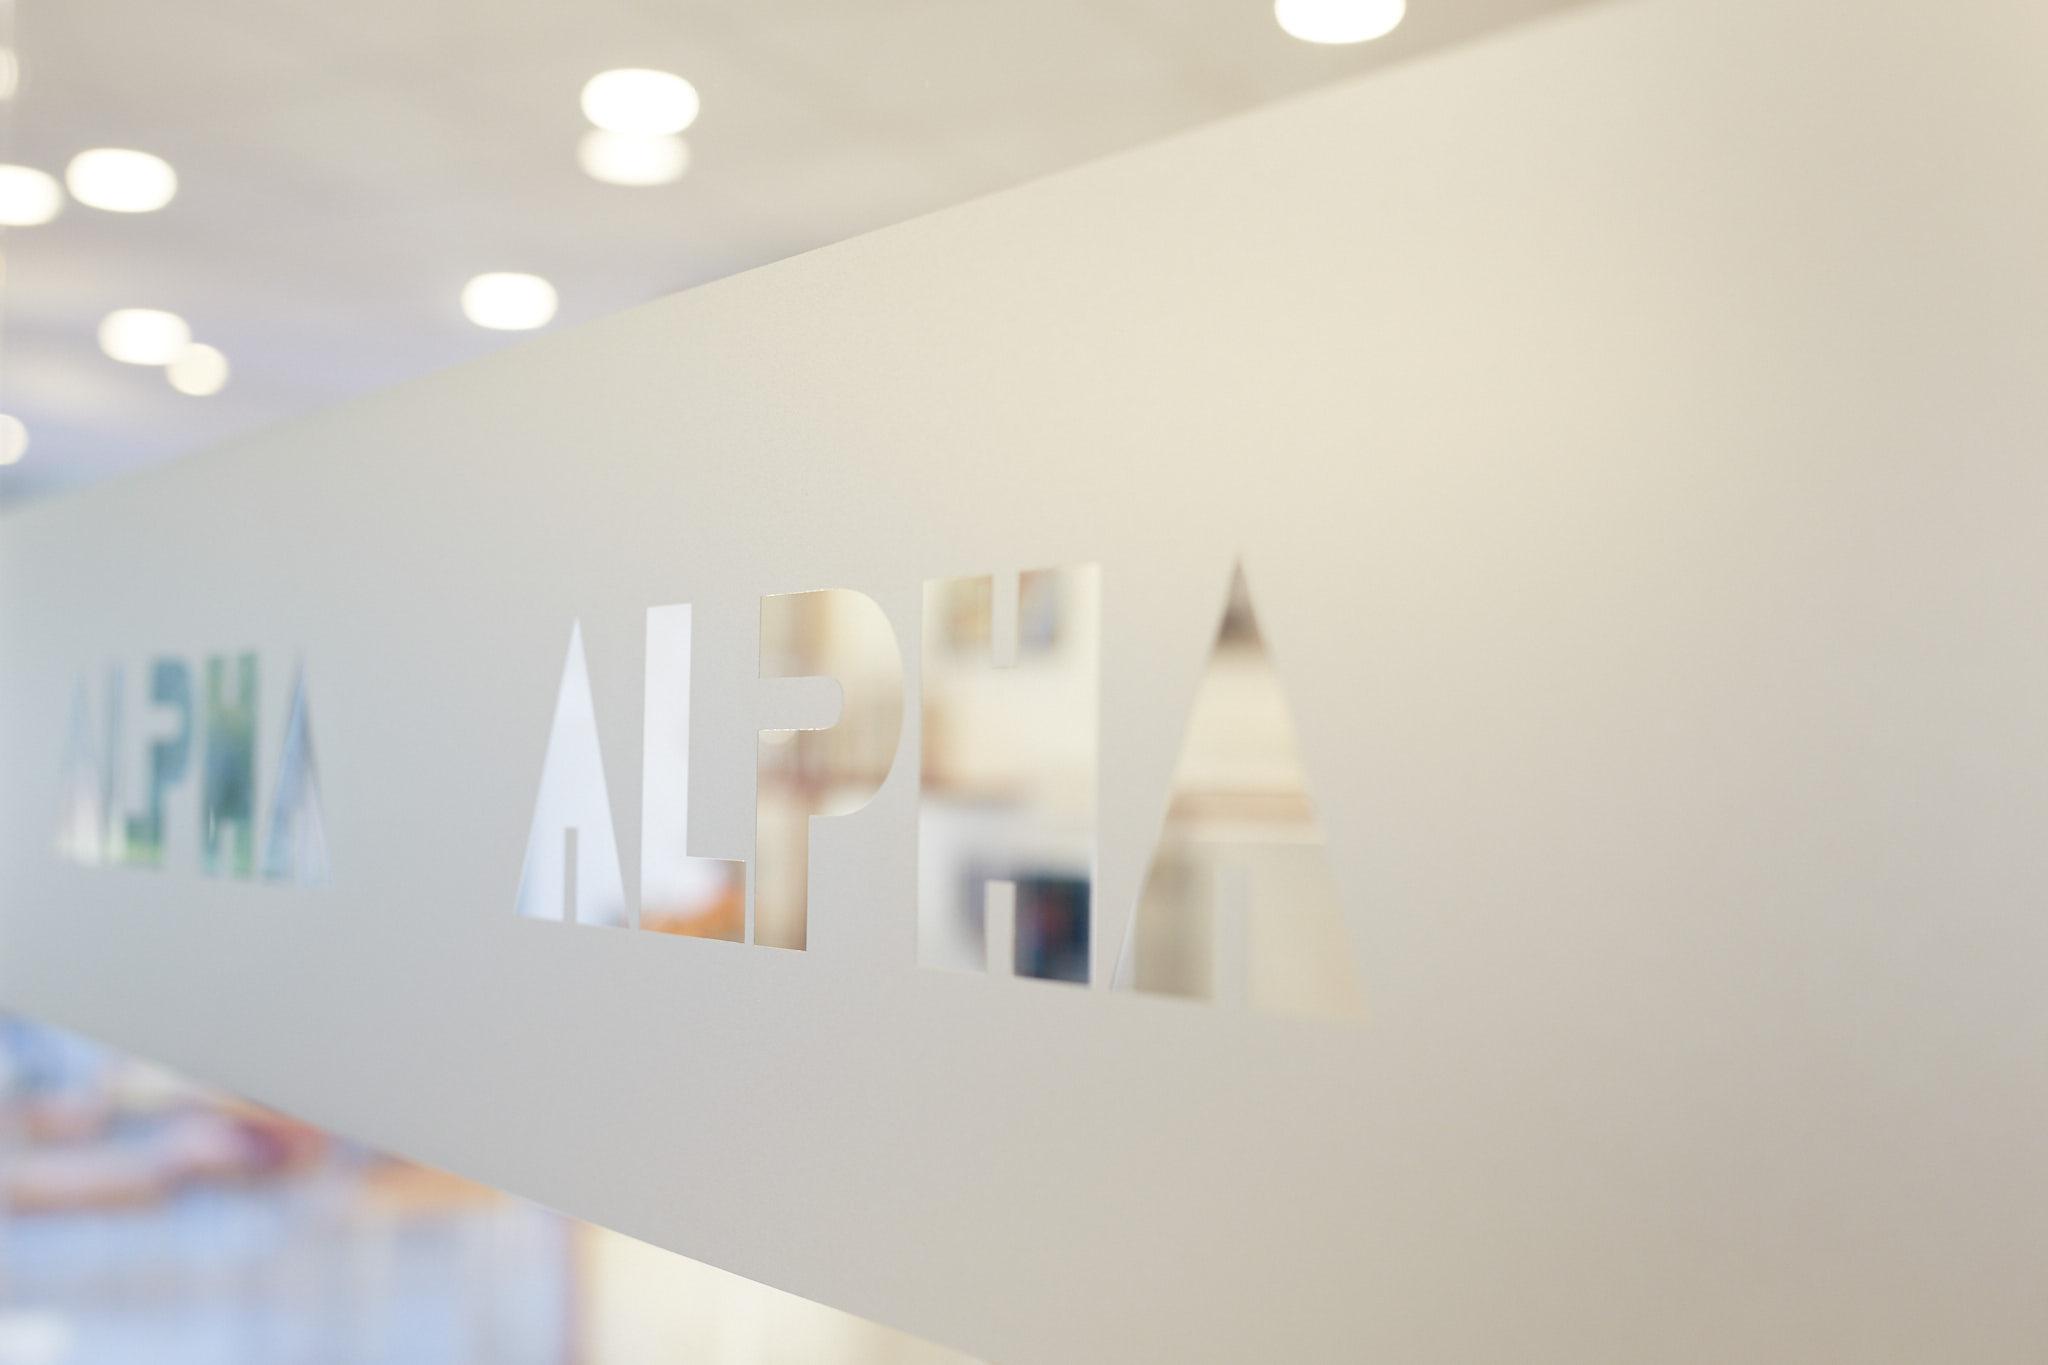 Glastür Hotel Alpha